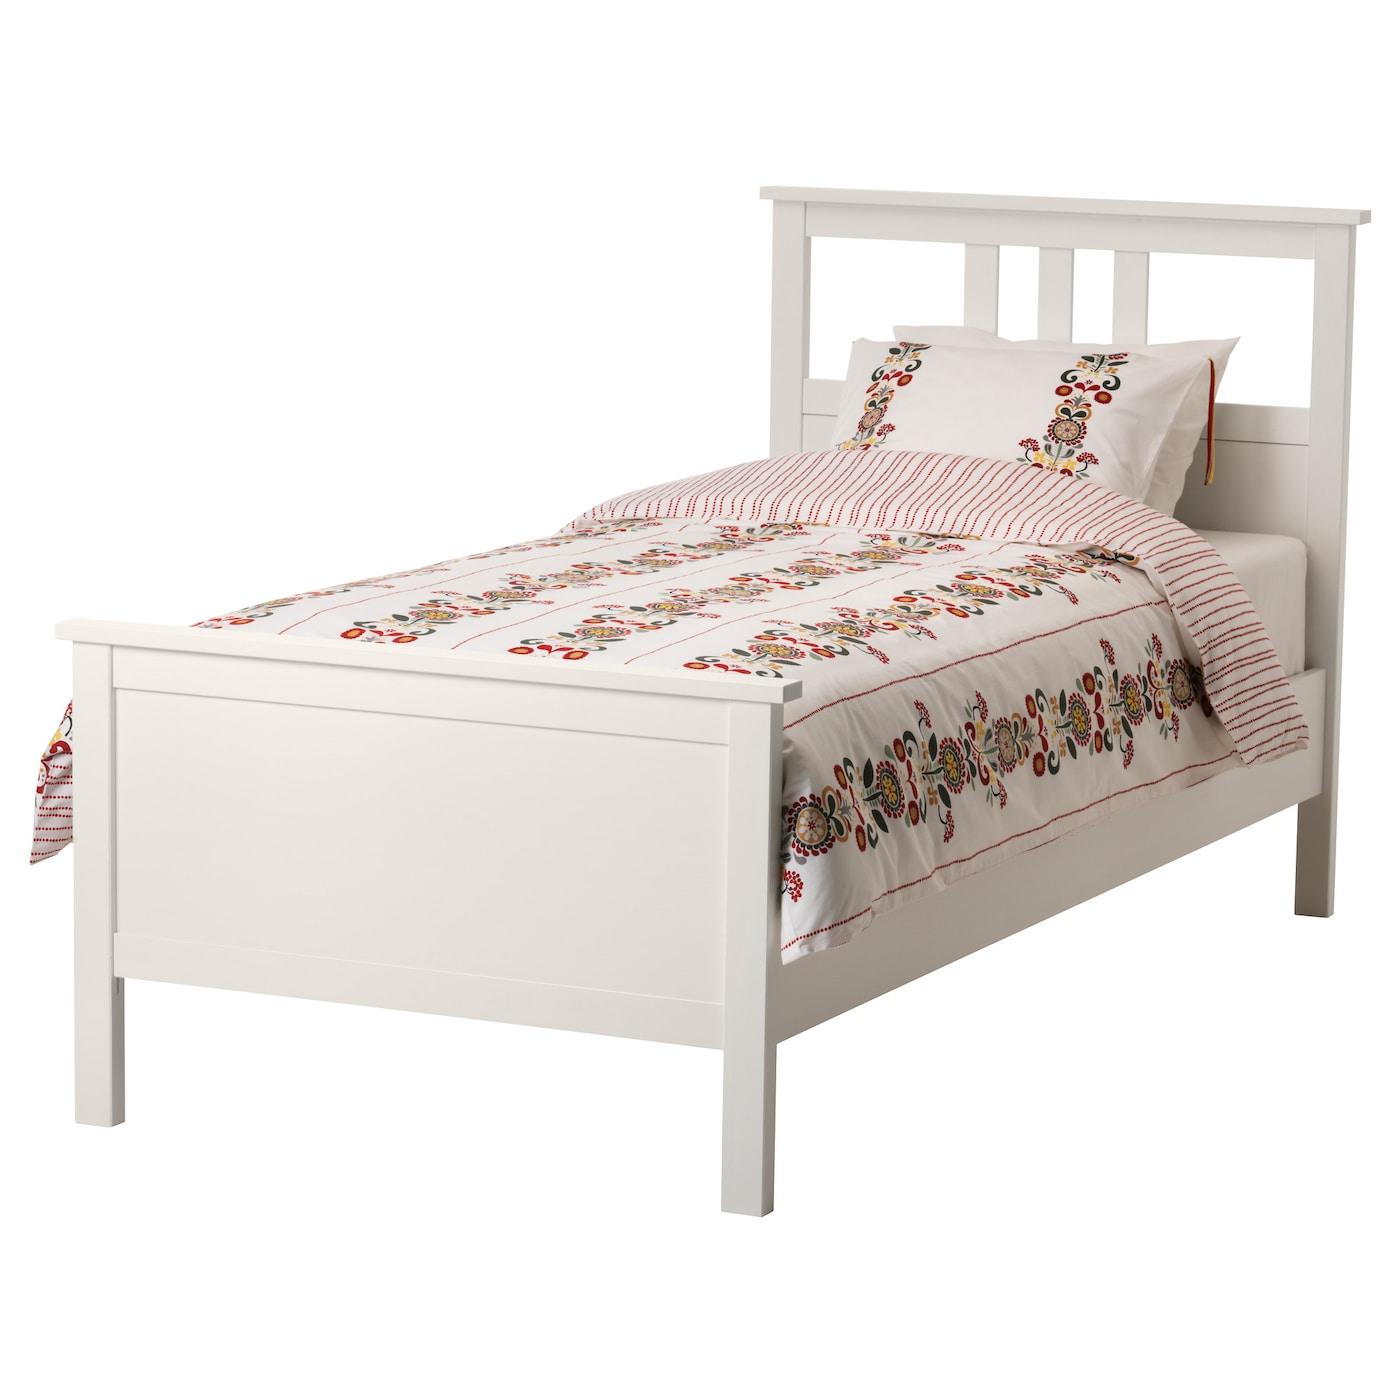 HEMNES Bed frame White stain leirsund Standard Single IKEA